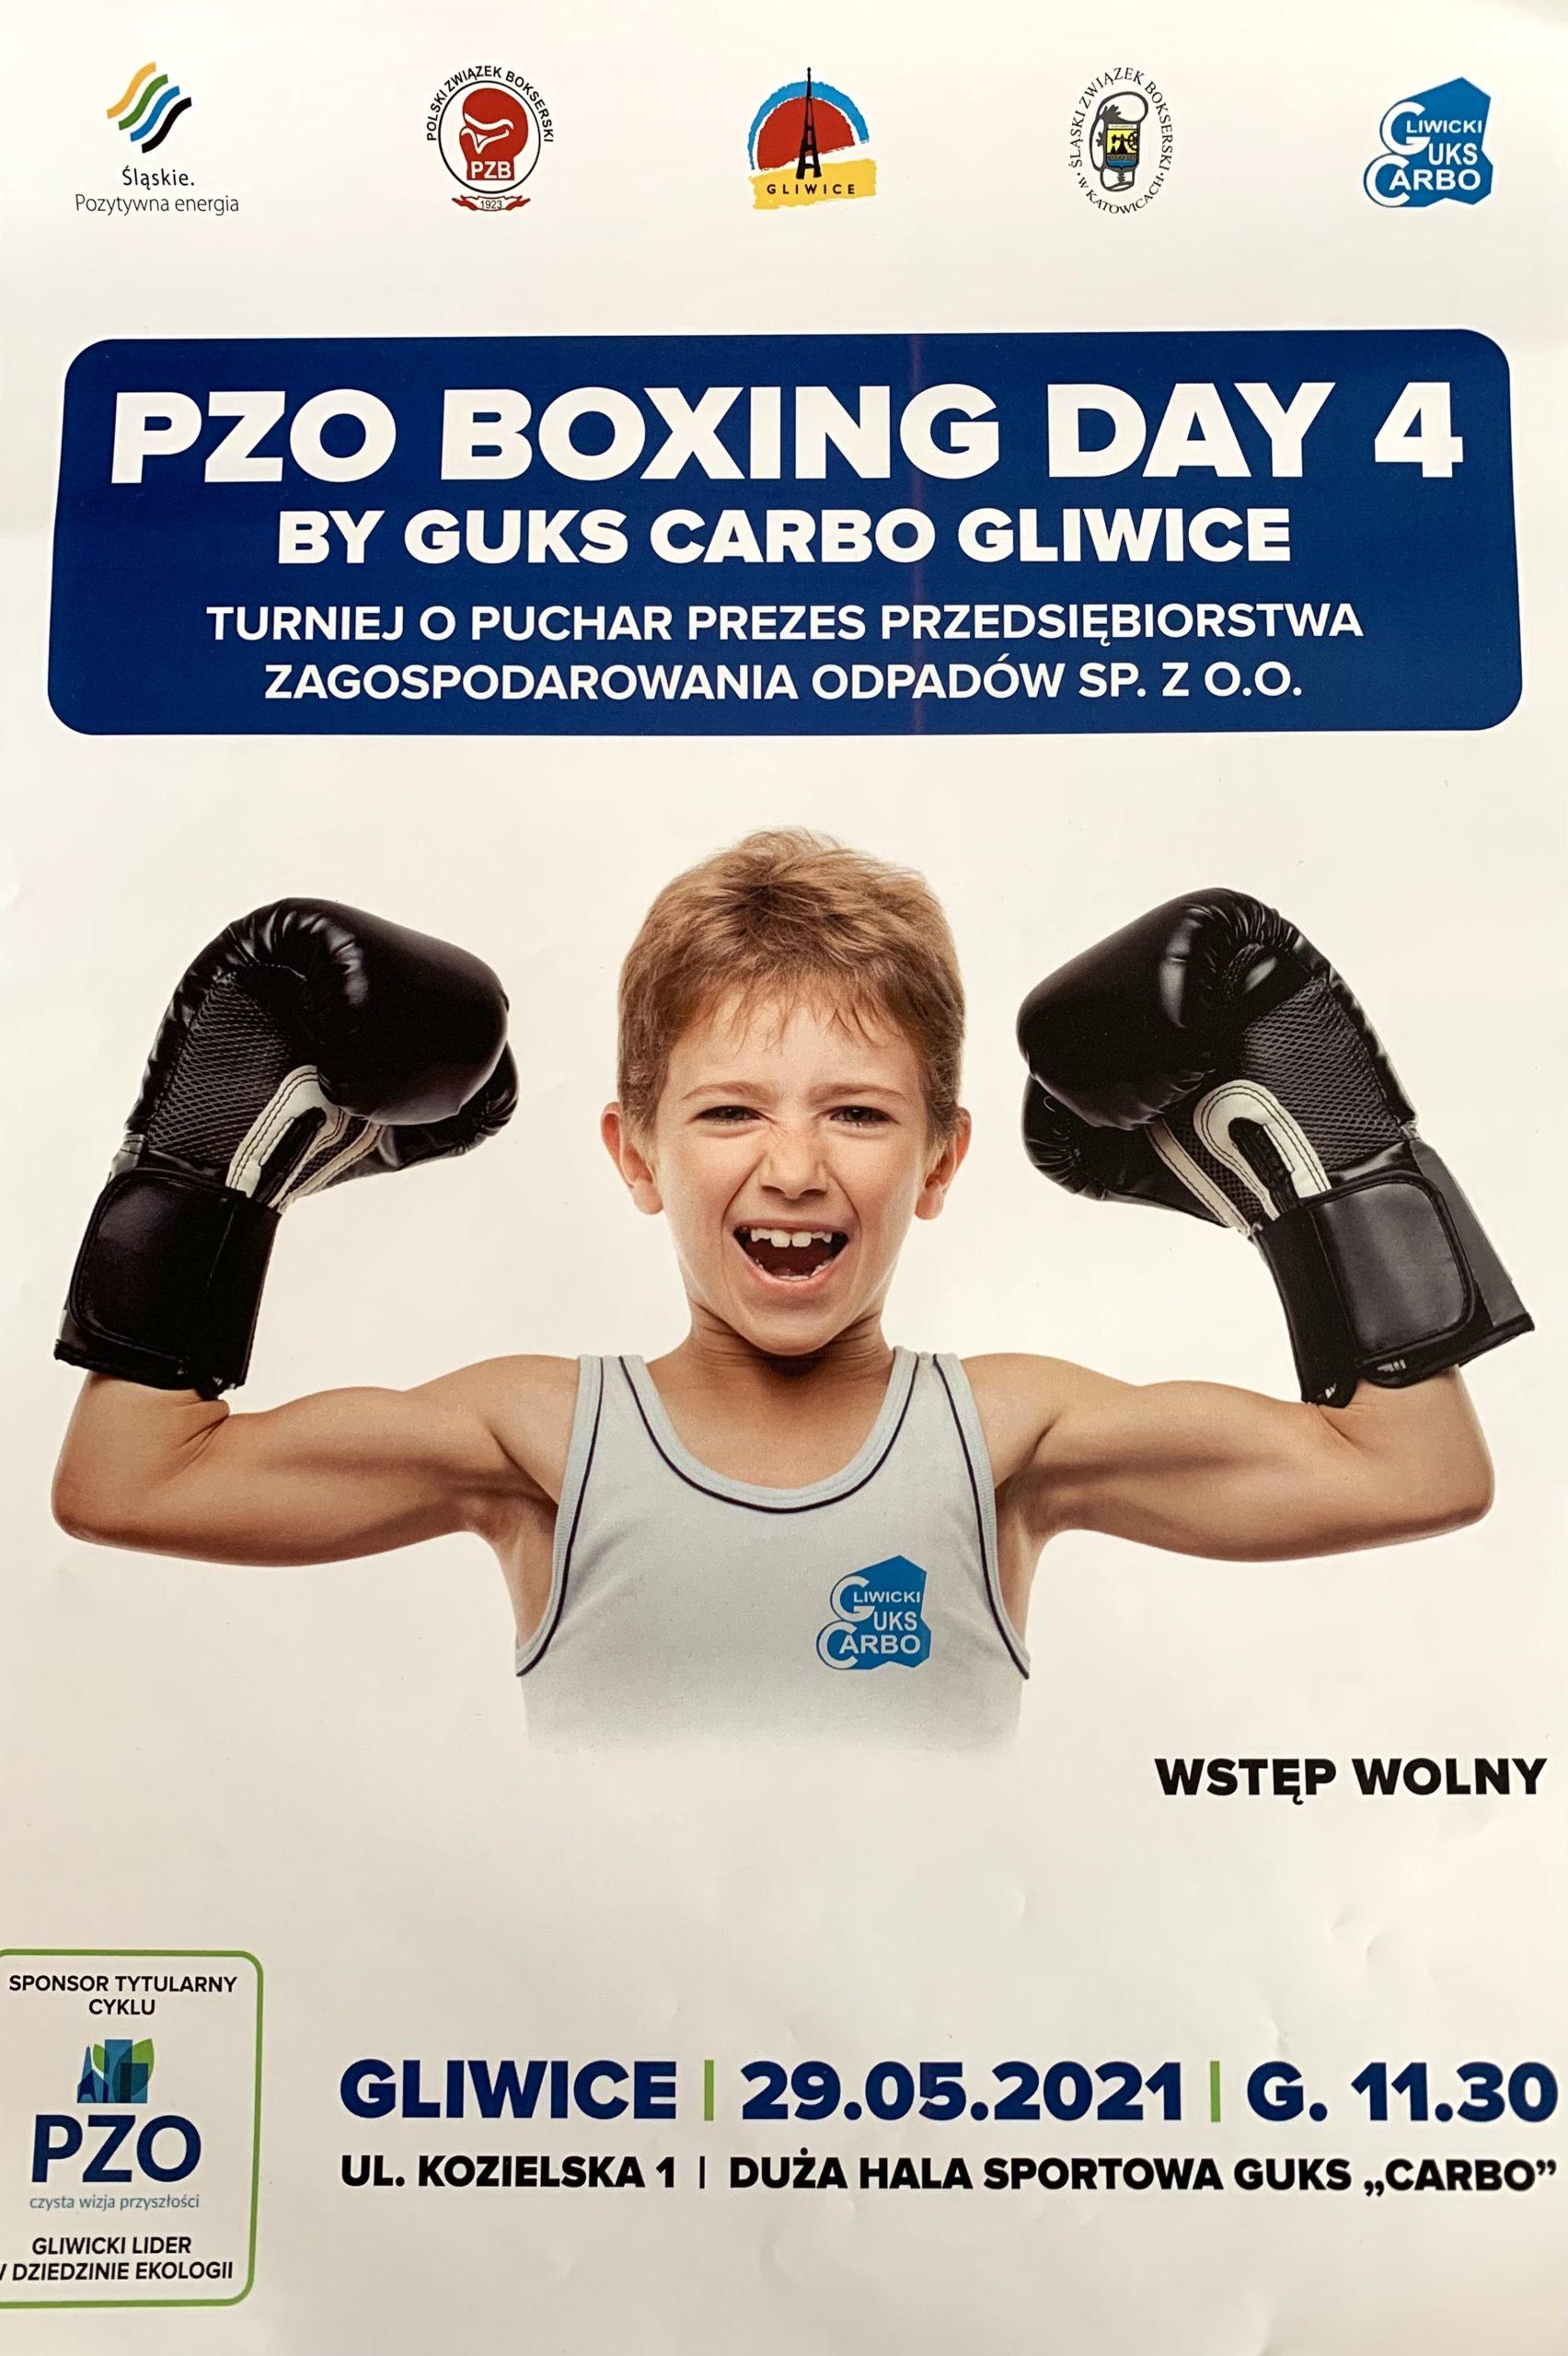 PZO BOXING DAY